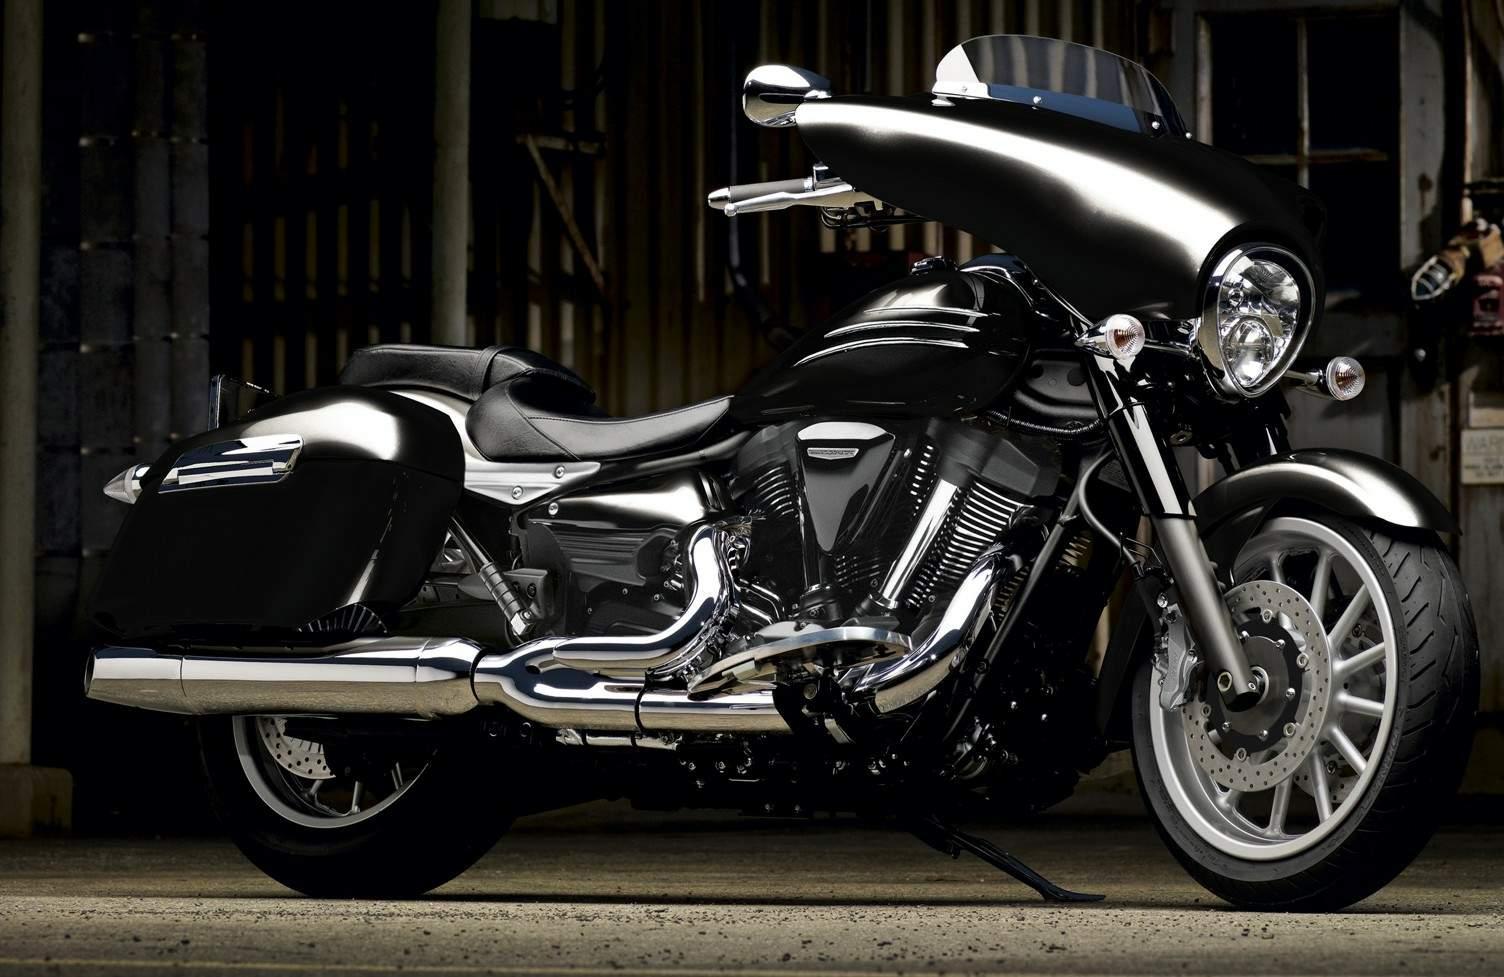 мотоцикл yamaha xvs950